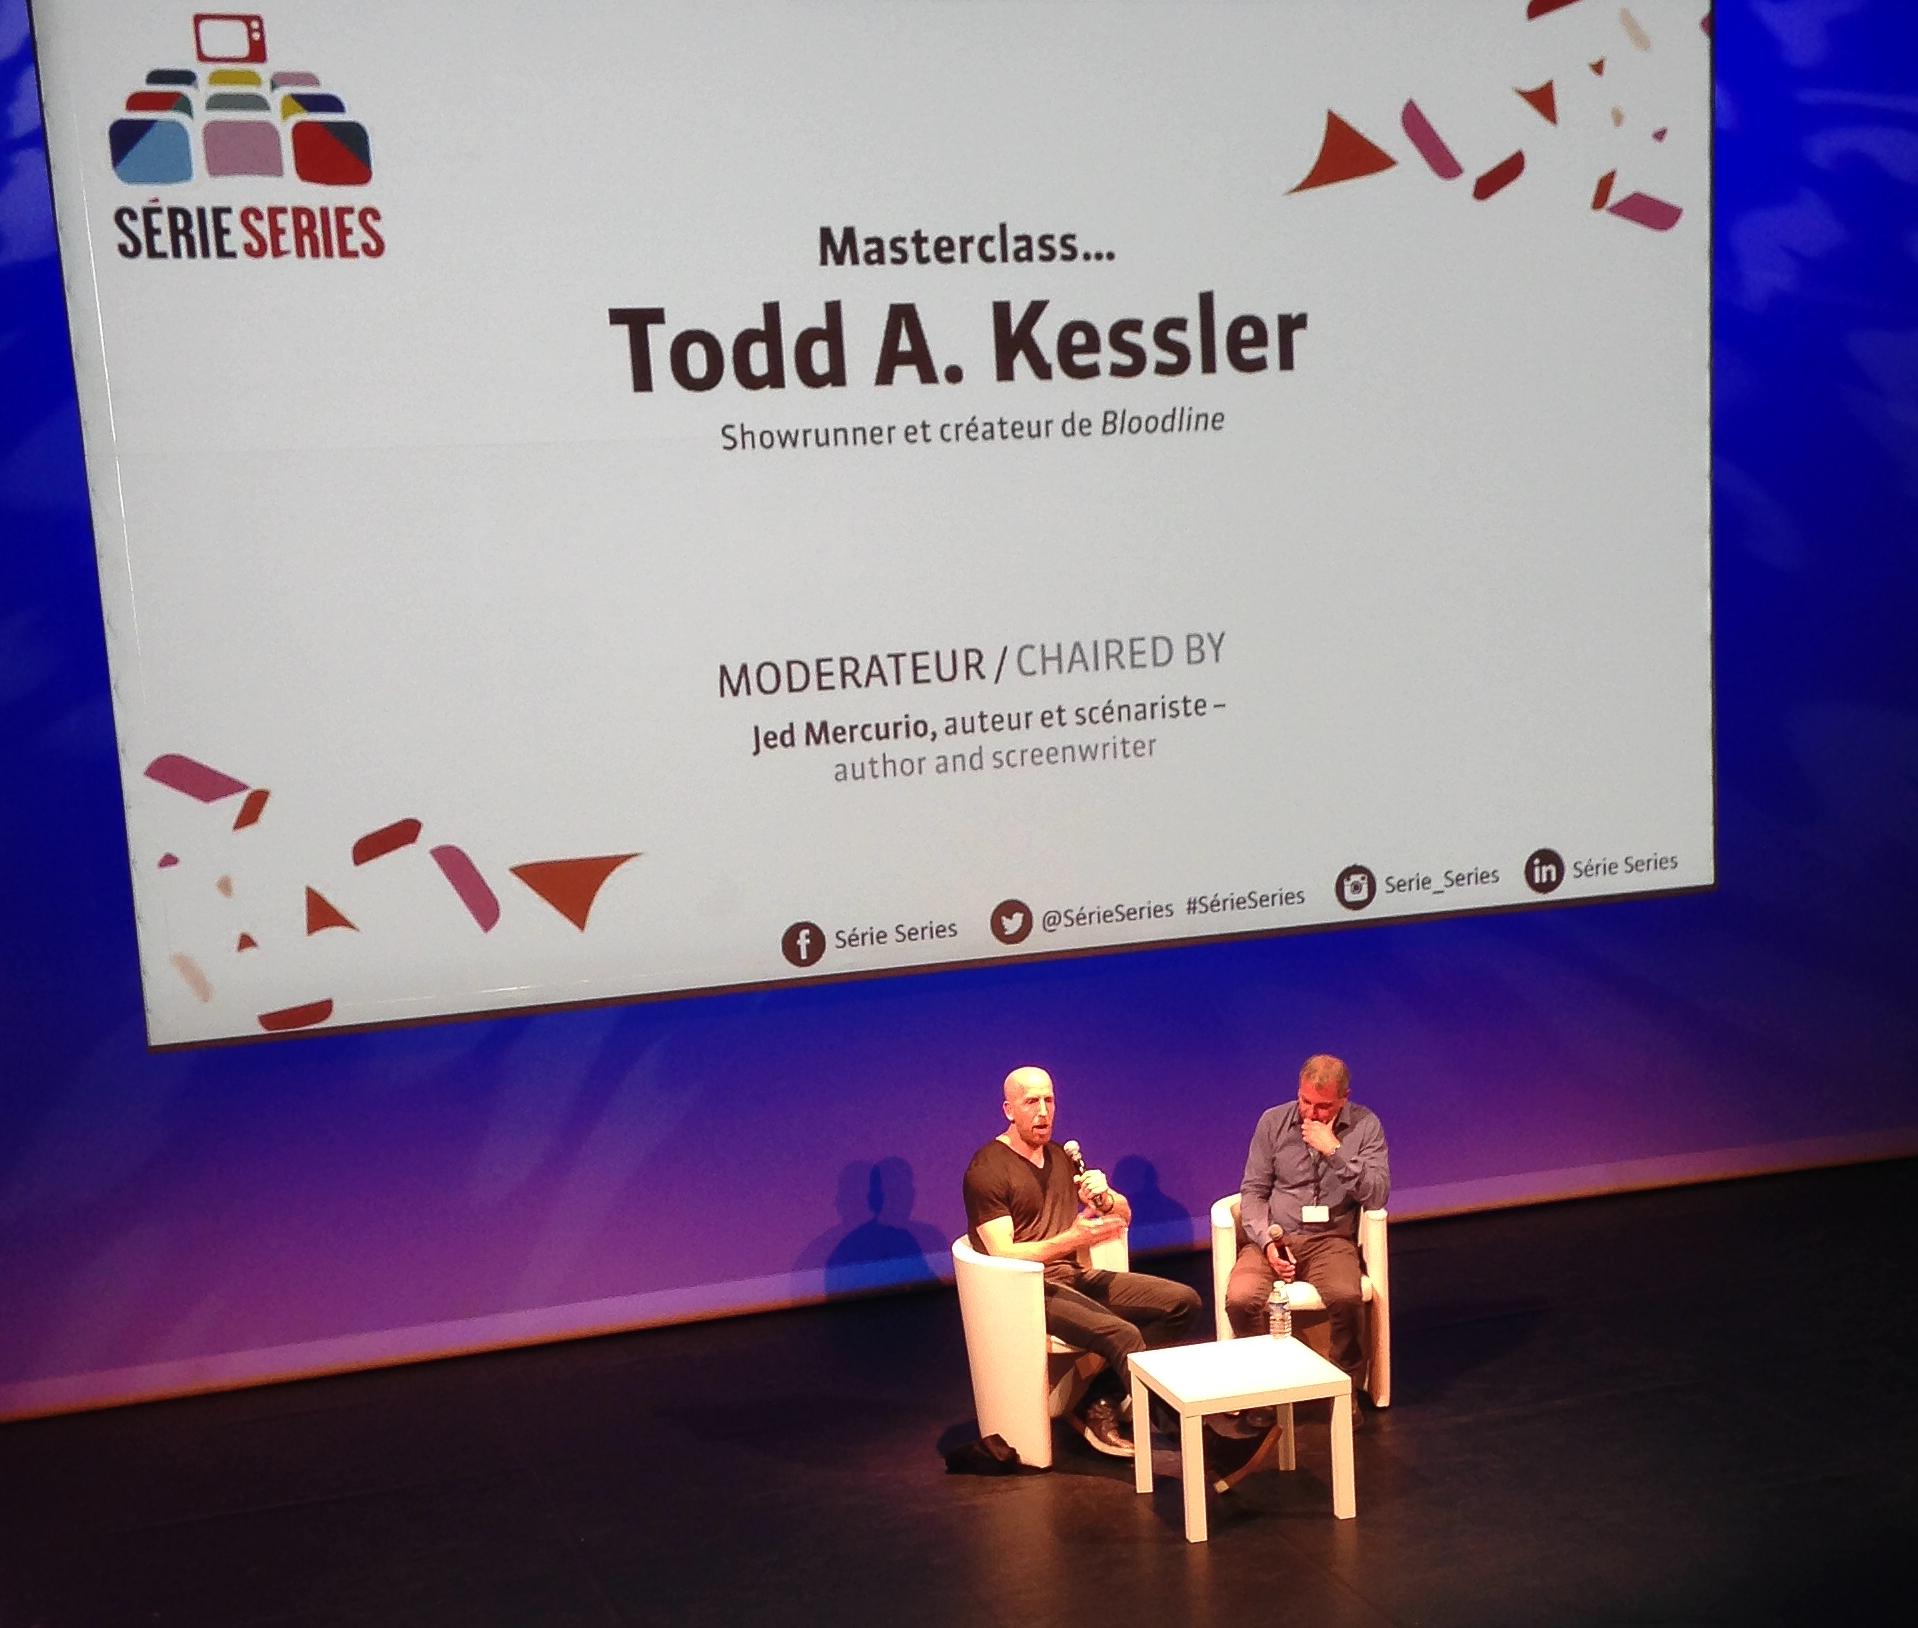 Série Series - Todd A Kessler